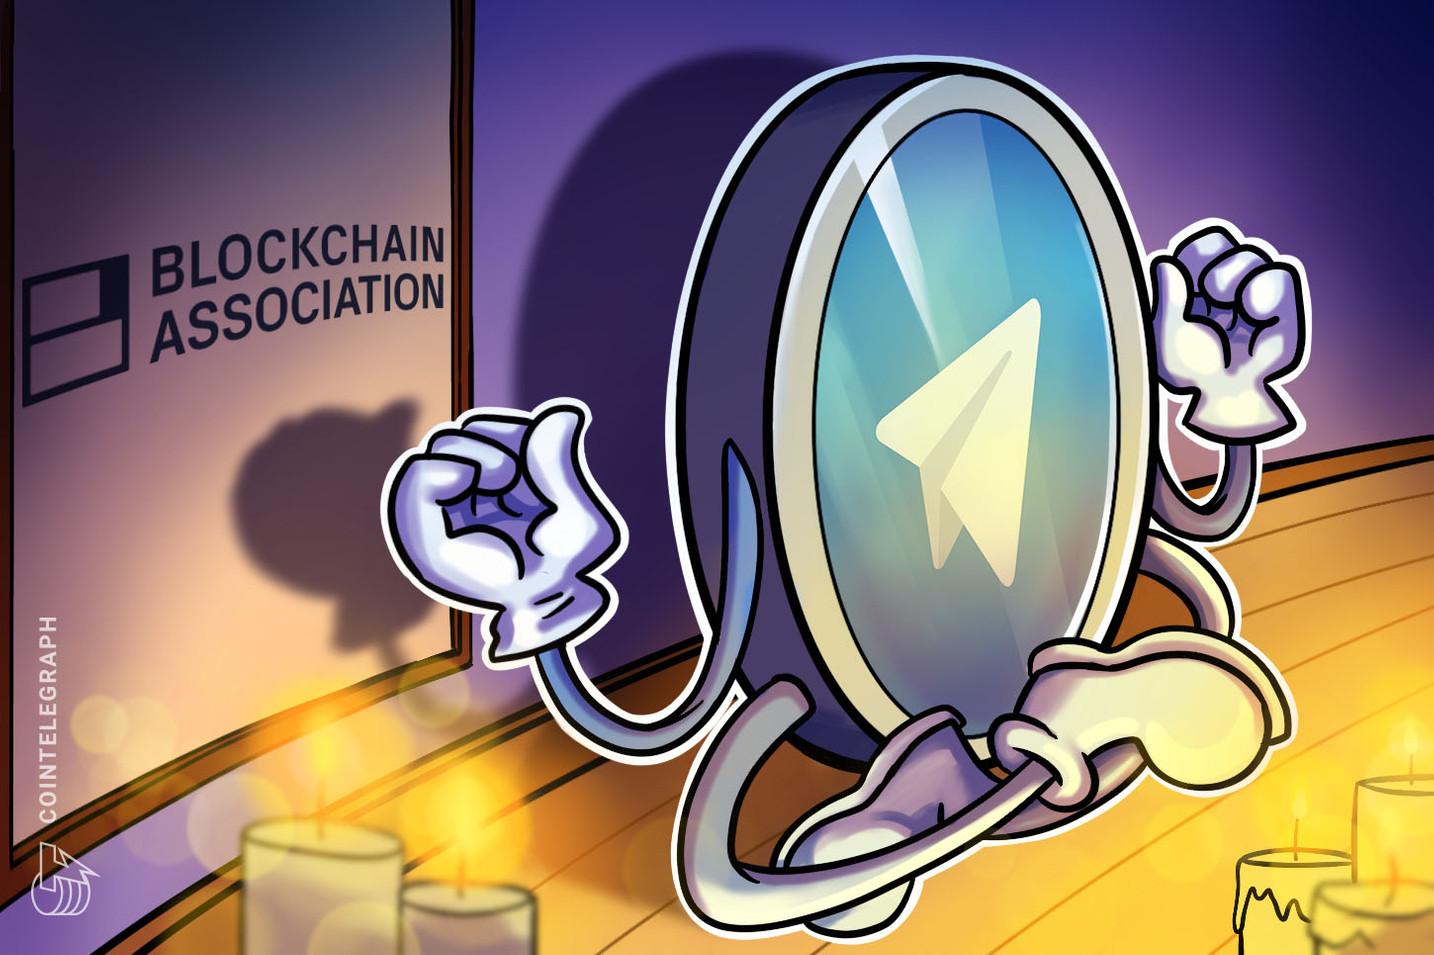 Blockchain Association Supports Telegram in Legal Battle With SEC